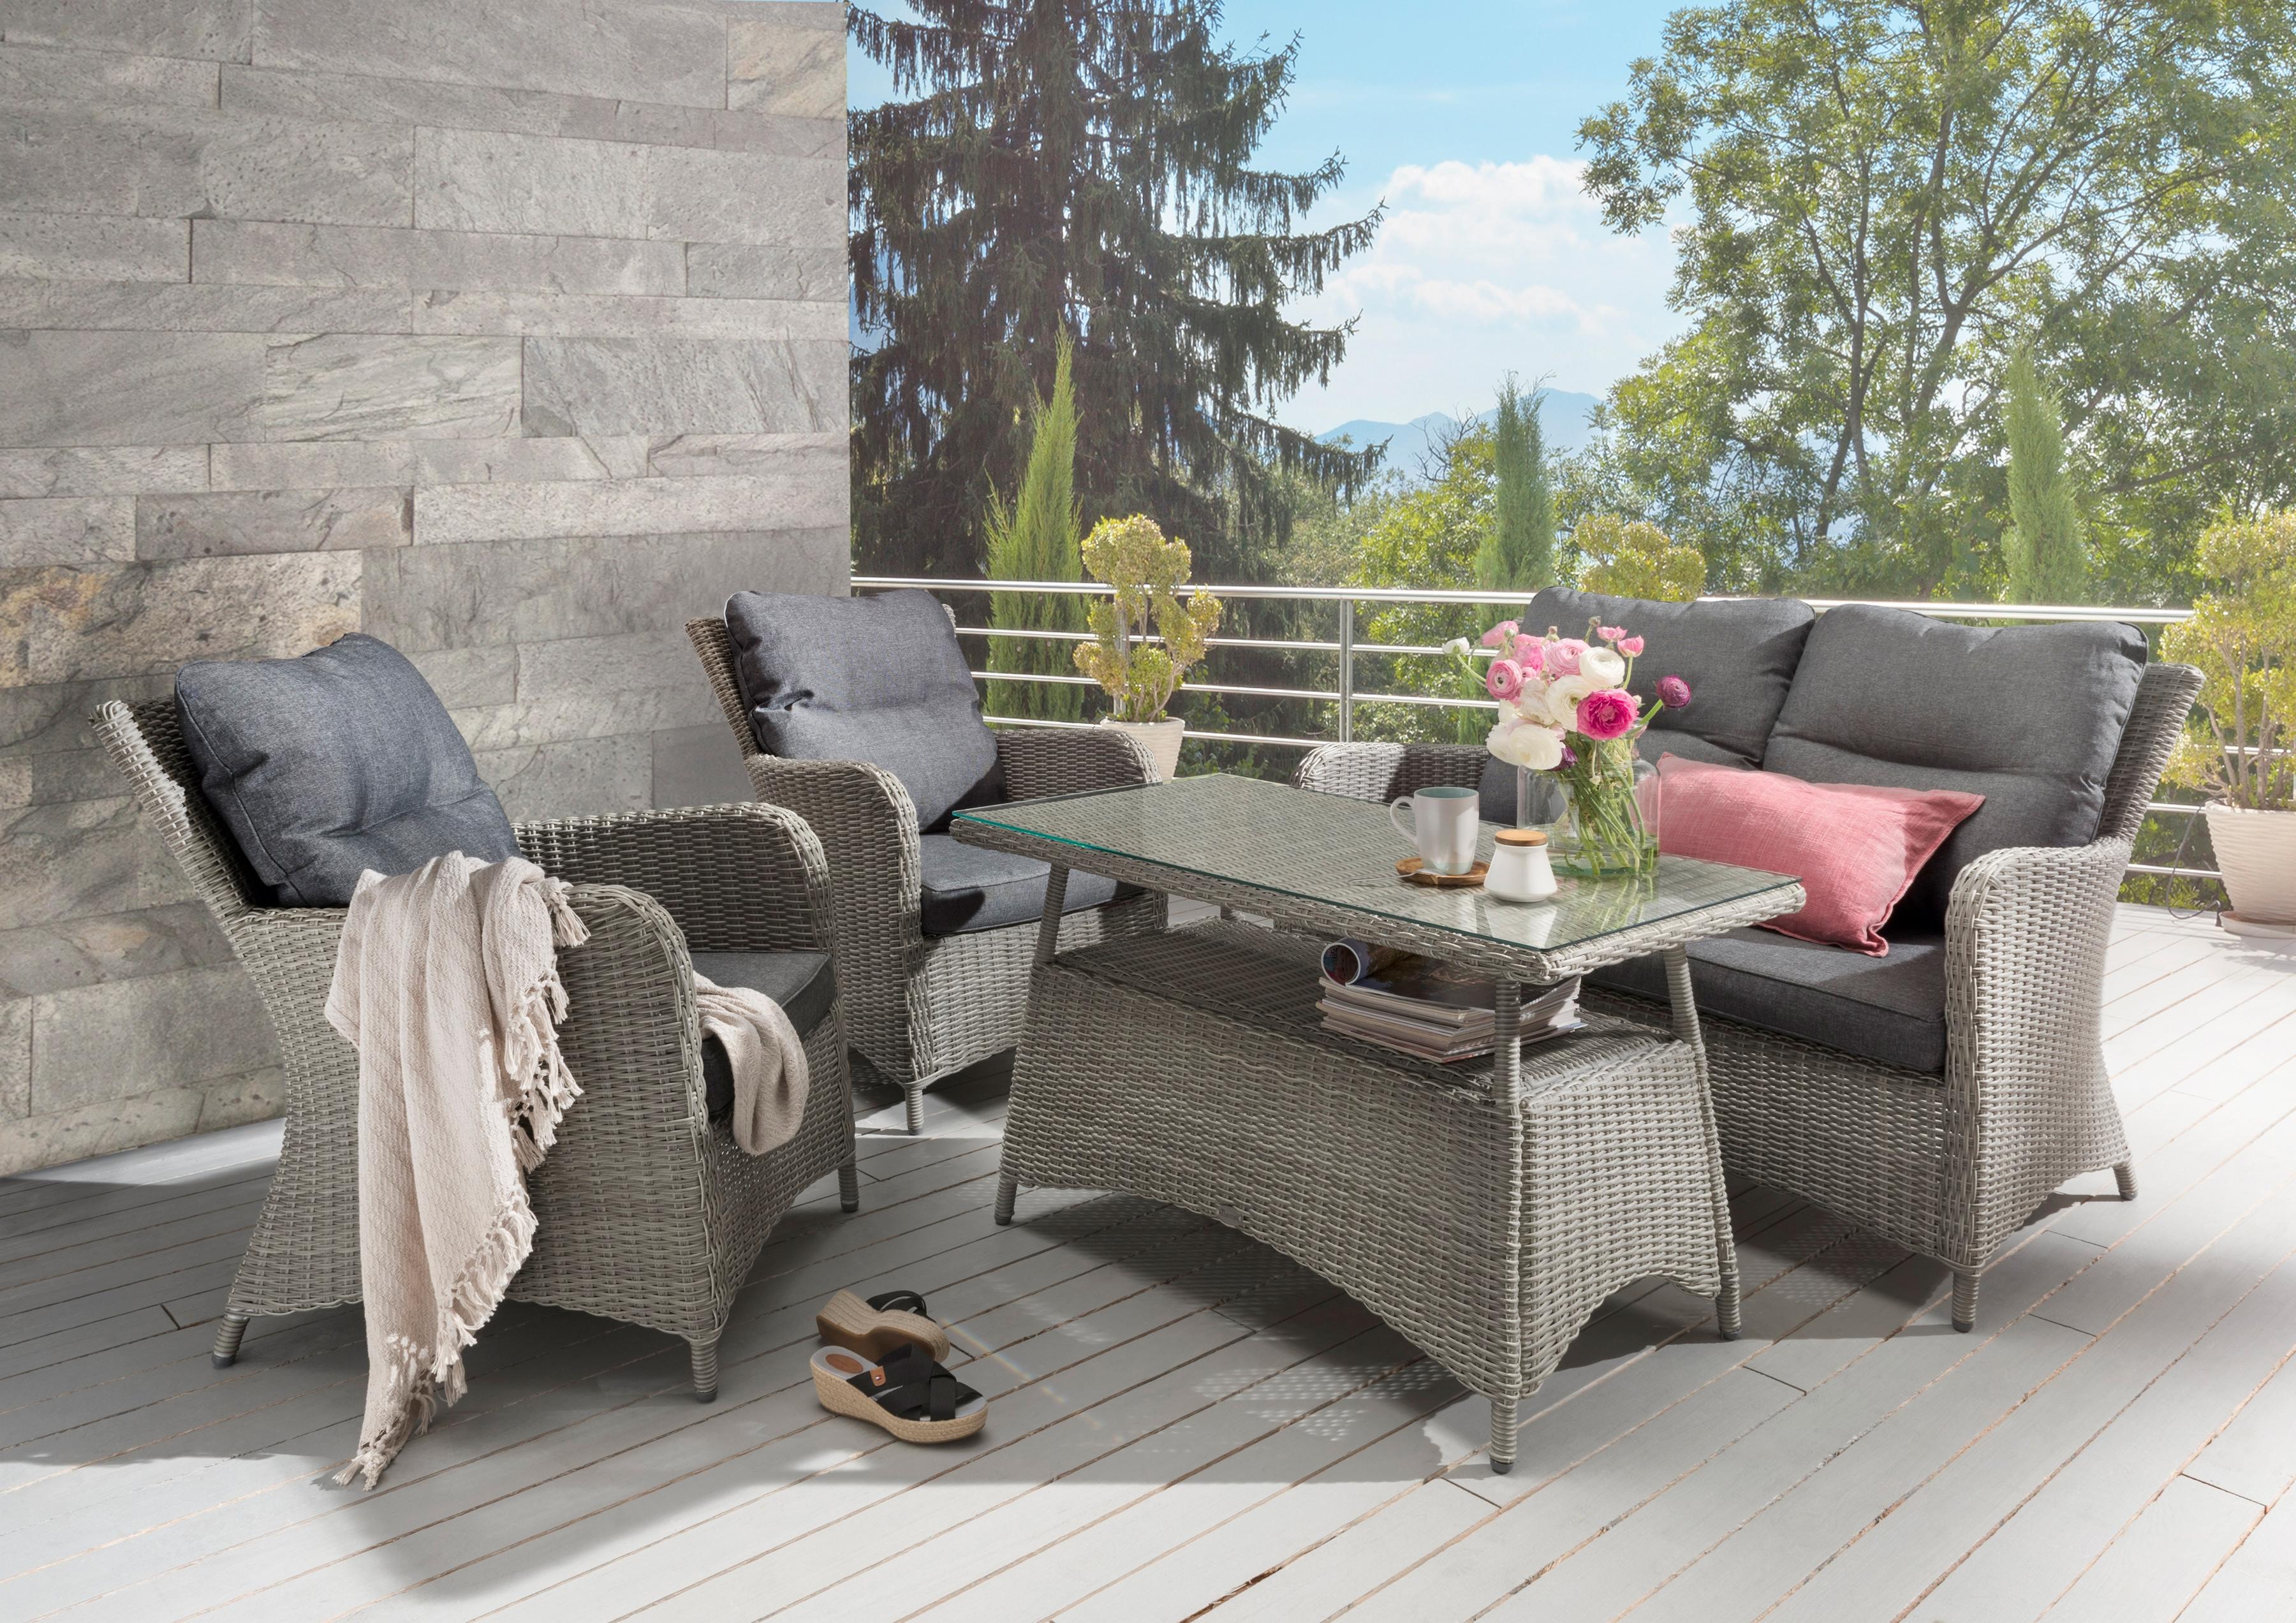 DESTINY Loungeset Paguera 4-tlg 2 Sessel Sitzbank Tisch 109x60 cm Alu/Polyrattan